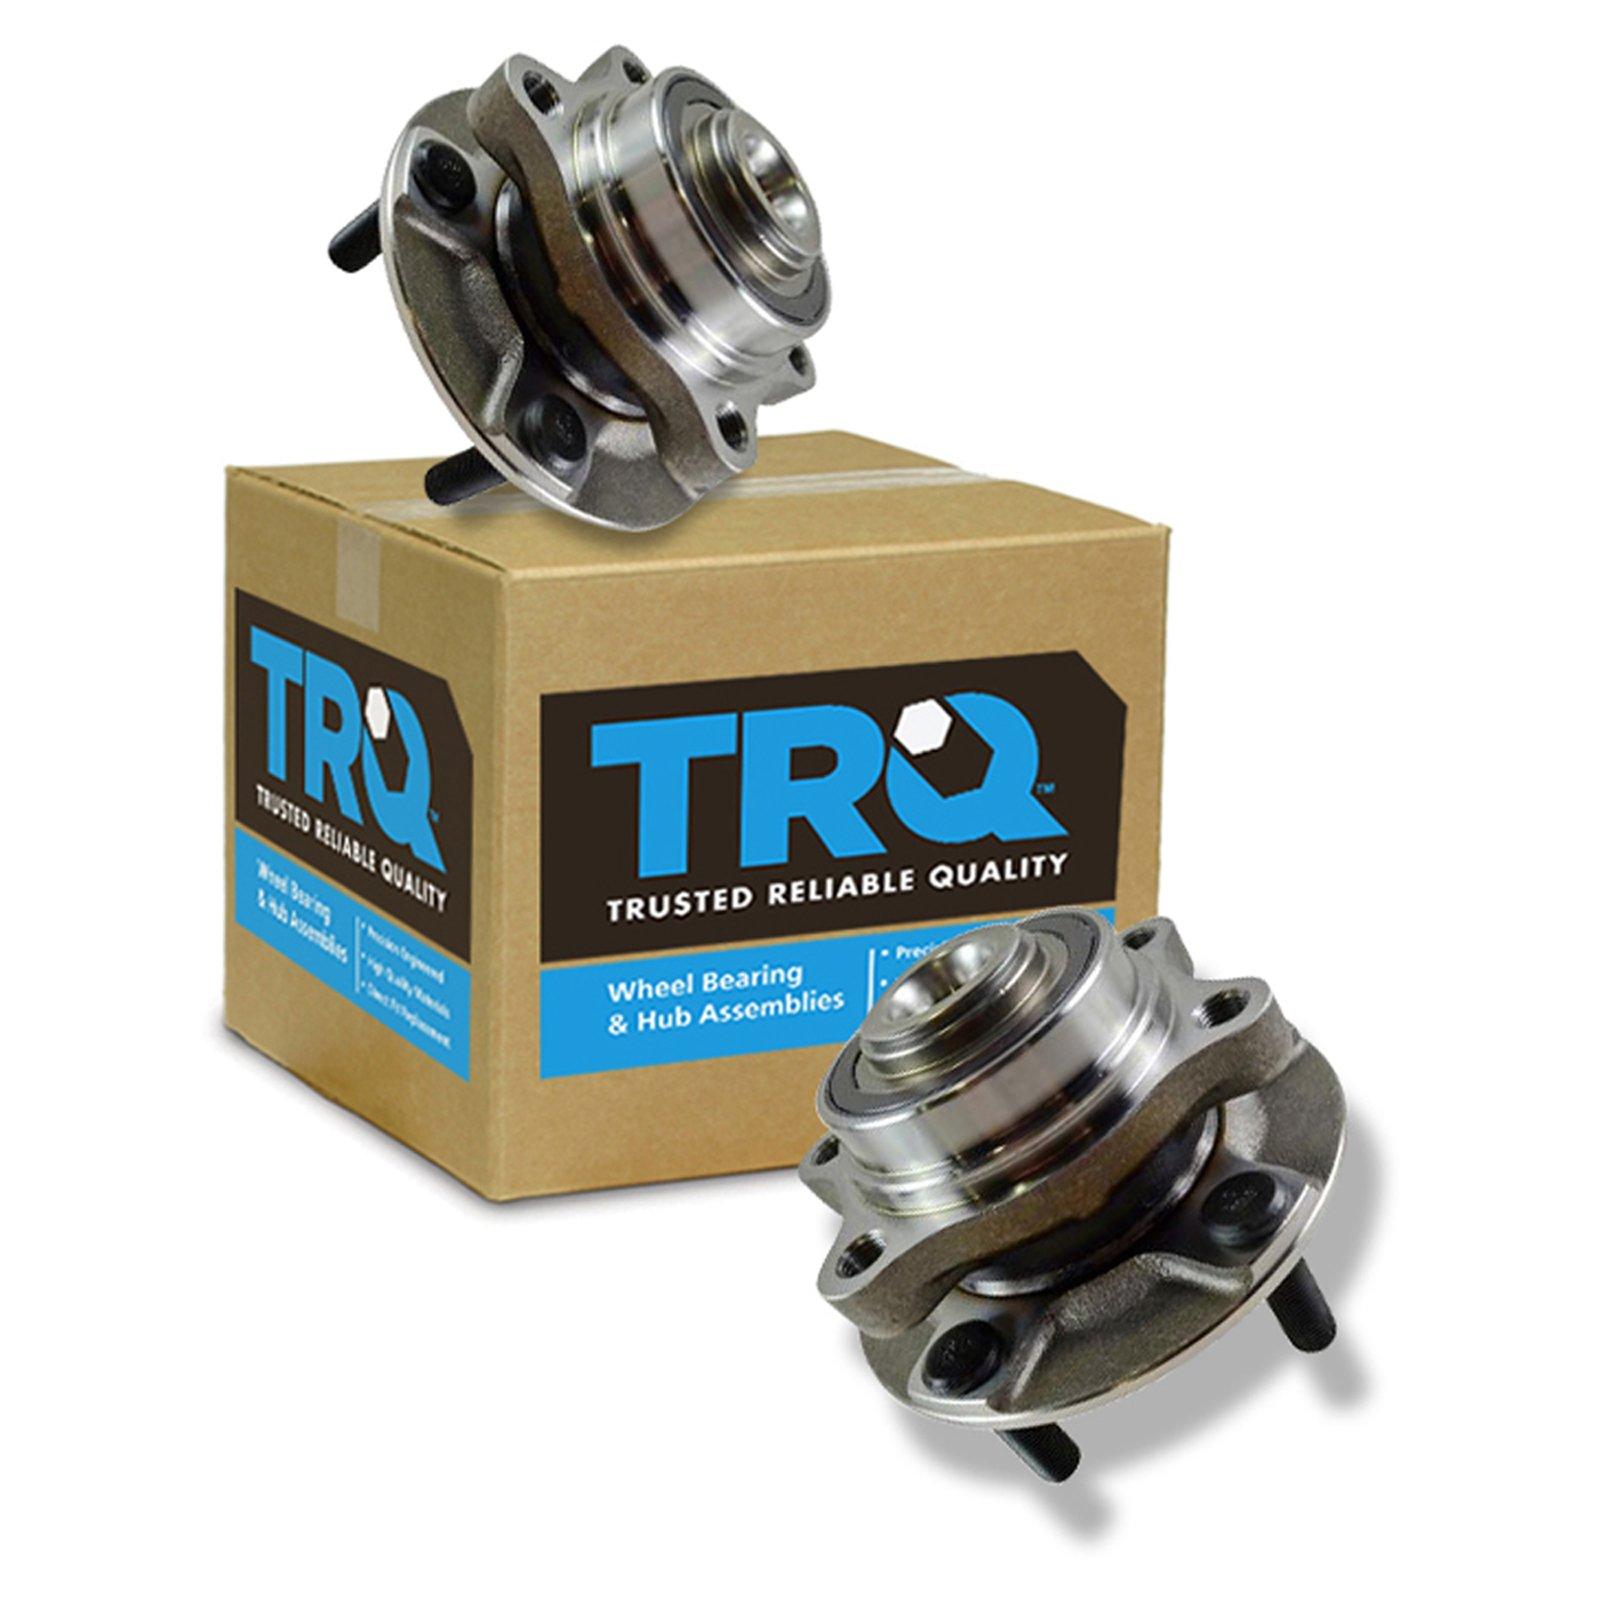 TRQ Front Wheel Hubs & Bearings Left & Right Pair for Nissan 350Z Infiniti G35